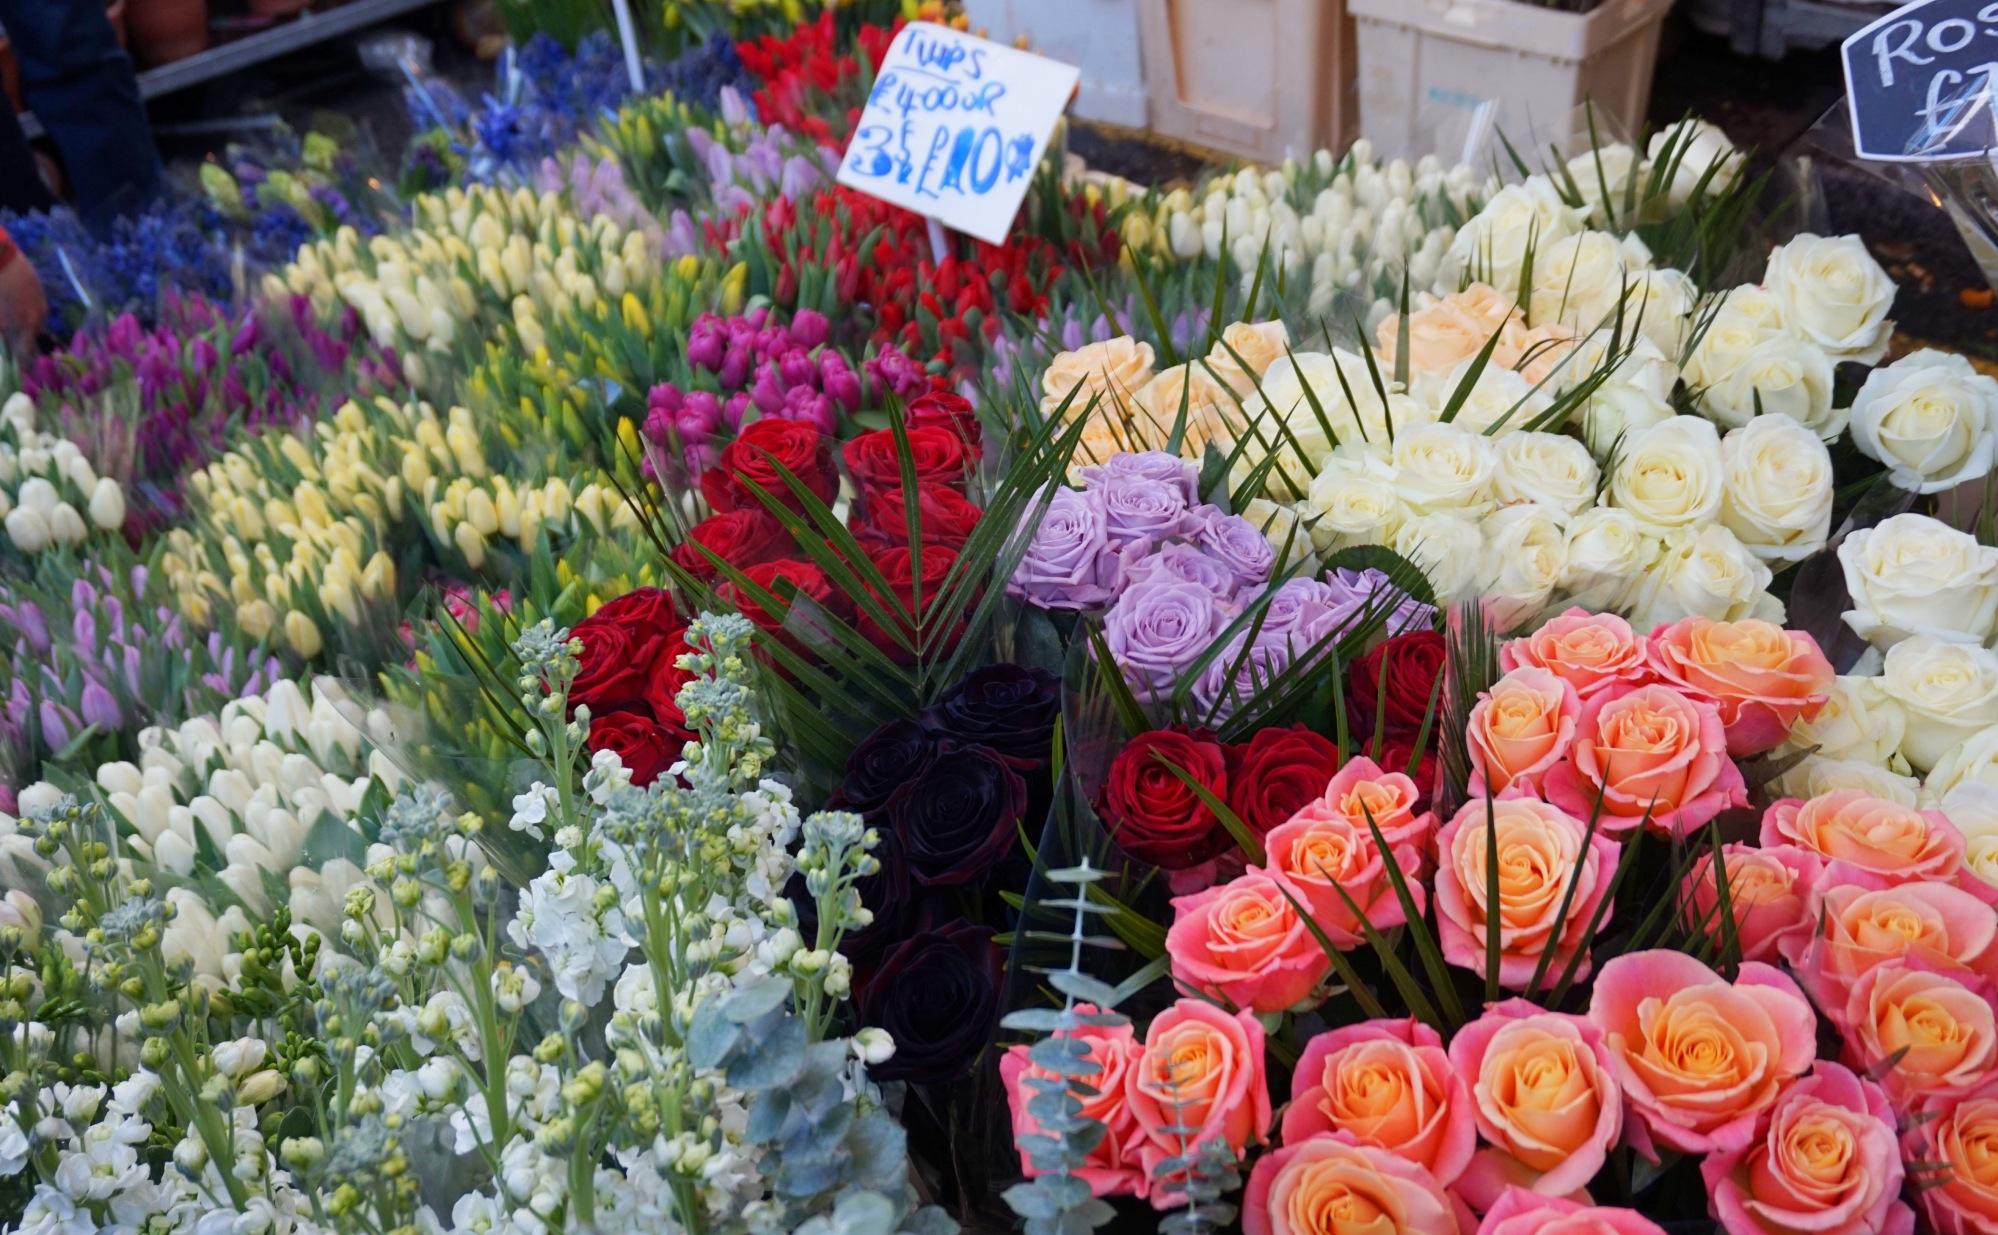 Balade-Columbia-Road-Flower-Market-10